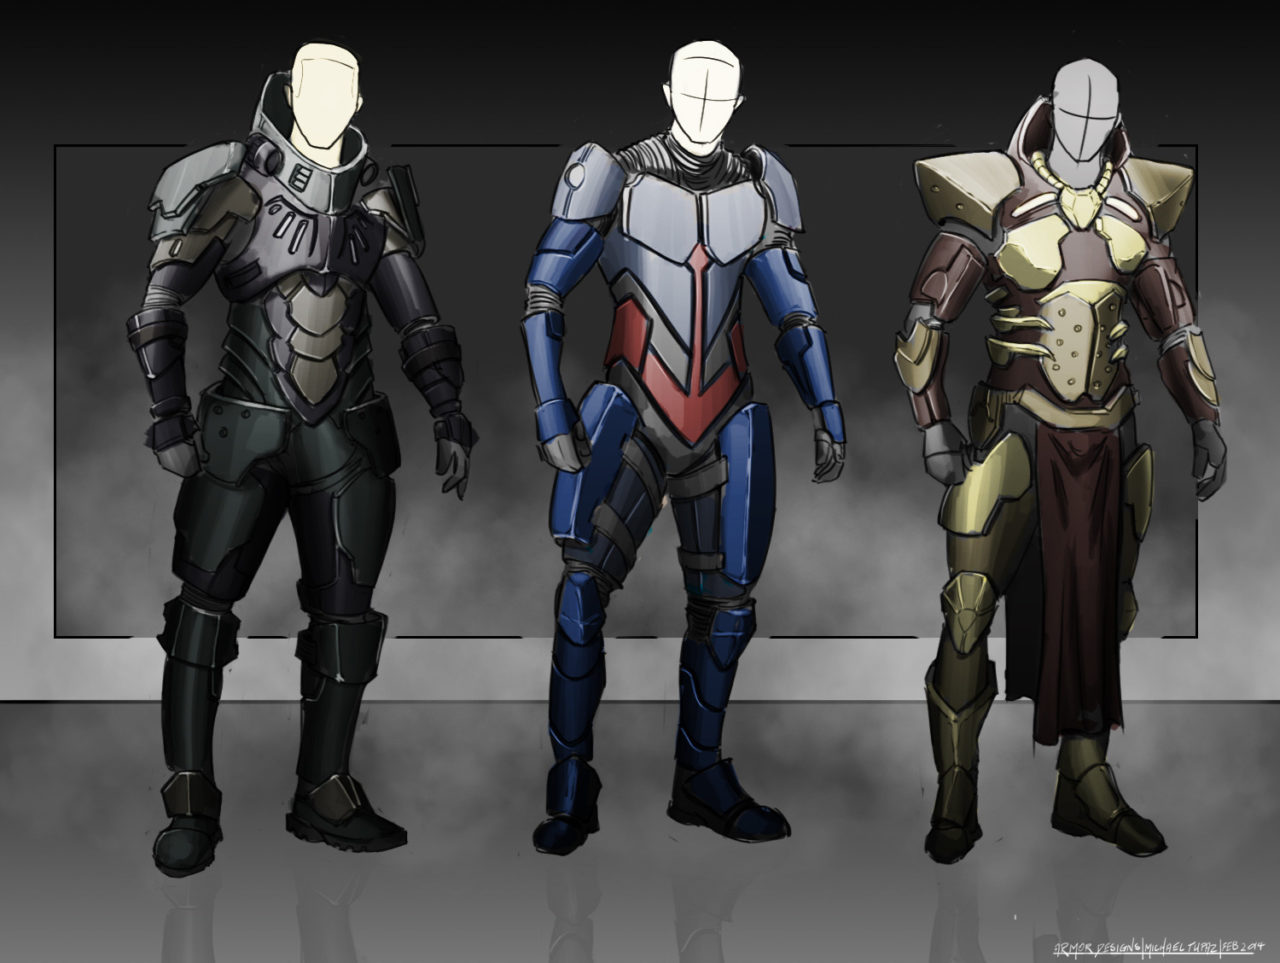 news_meet_gerard-michael-tupaz-armor-concept-art